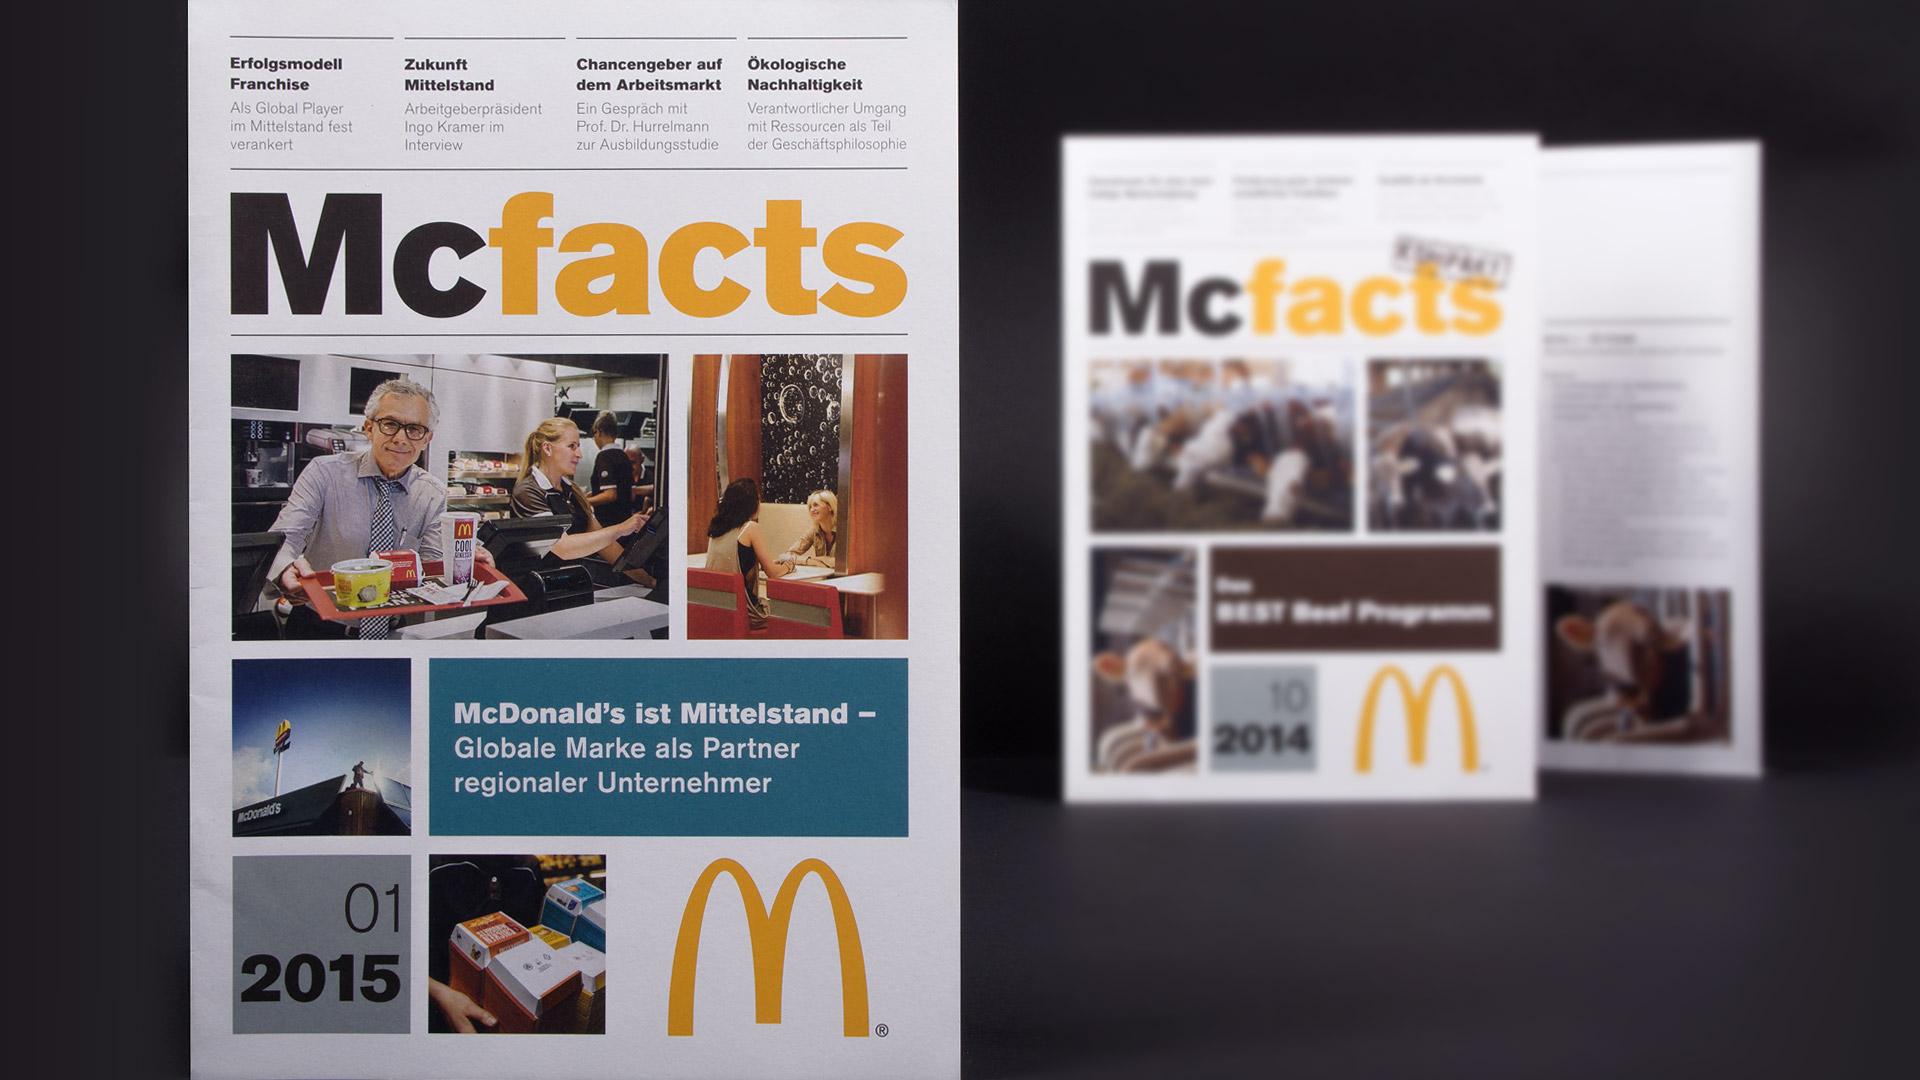 McFacts-Broschüre McDonald's